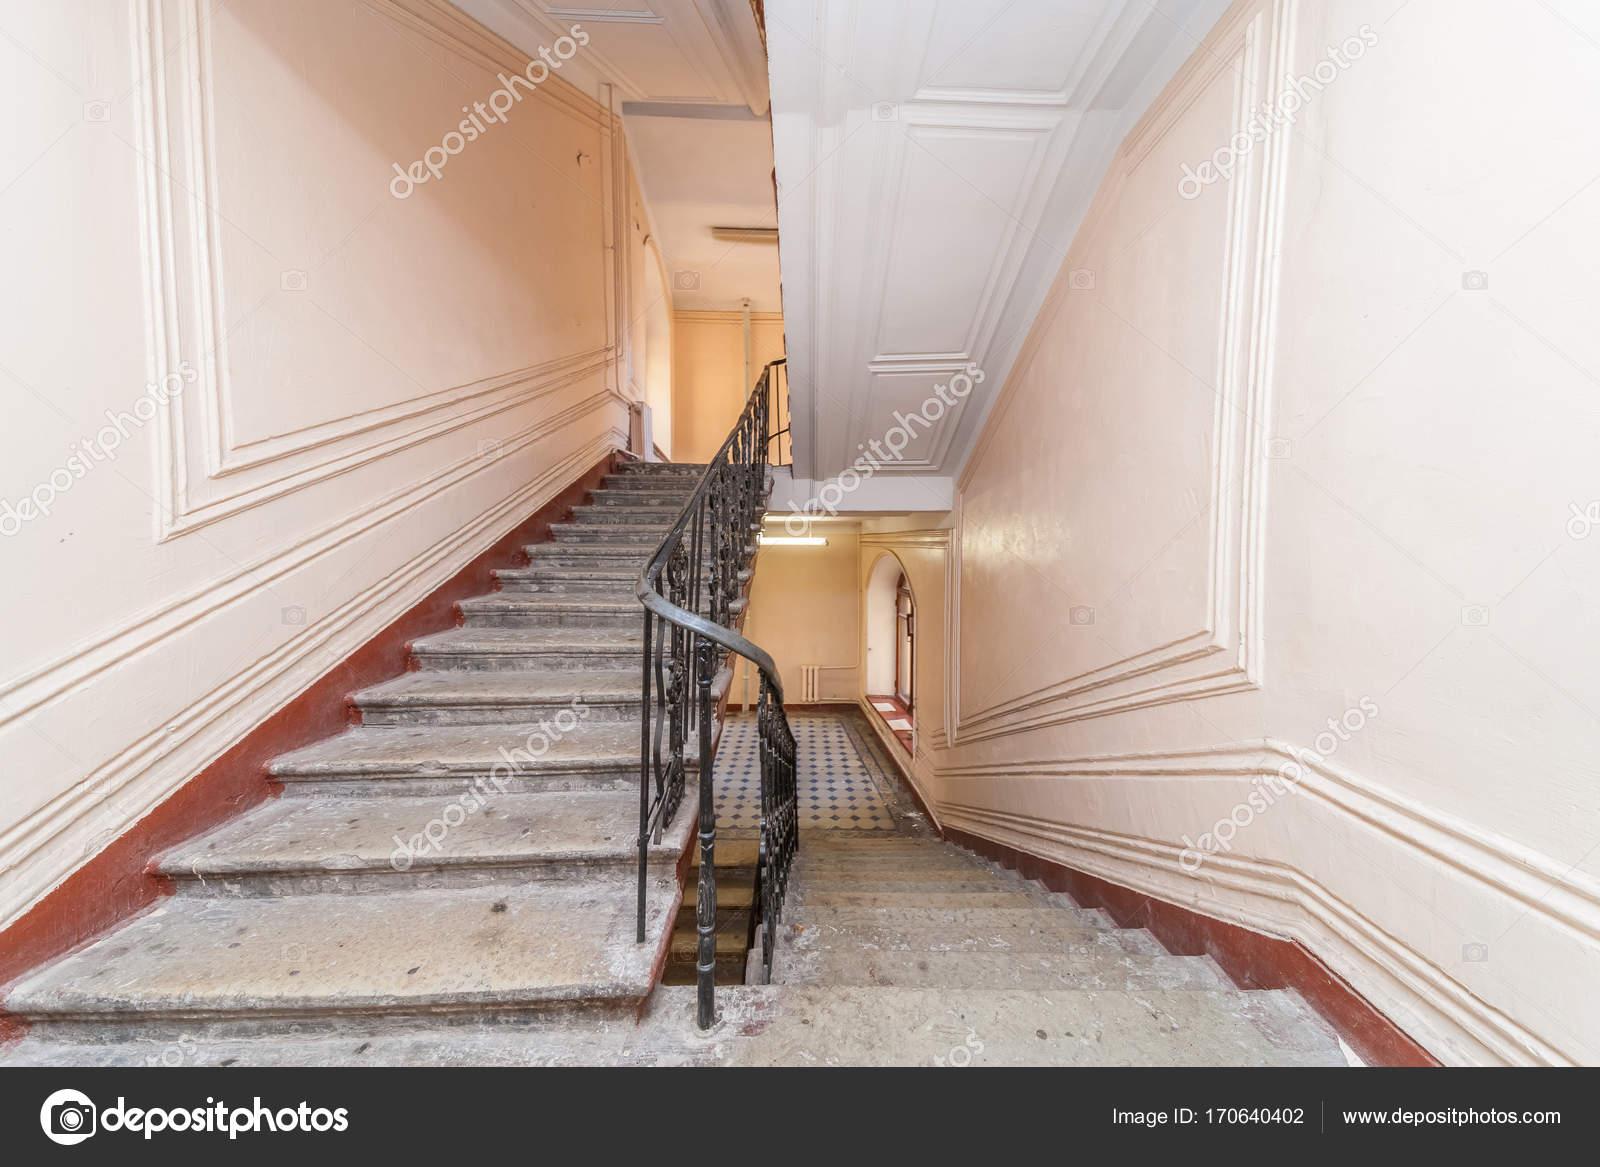 Treppenhaus mehrfamilienhaus  Mehrfamilienhaus Treppenhaus — Stockfoto © olgasweet #170640402